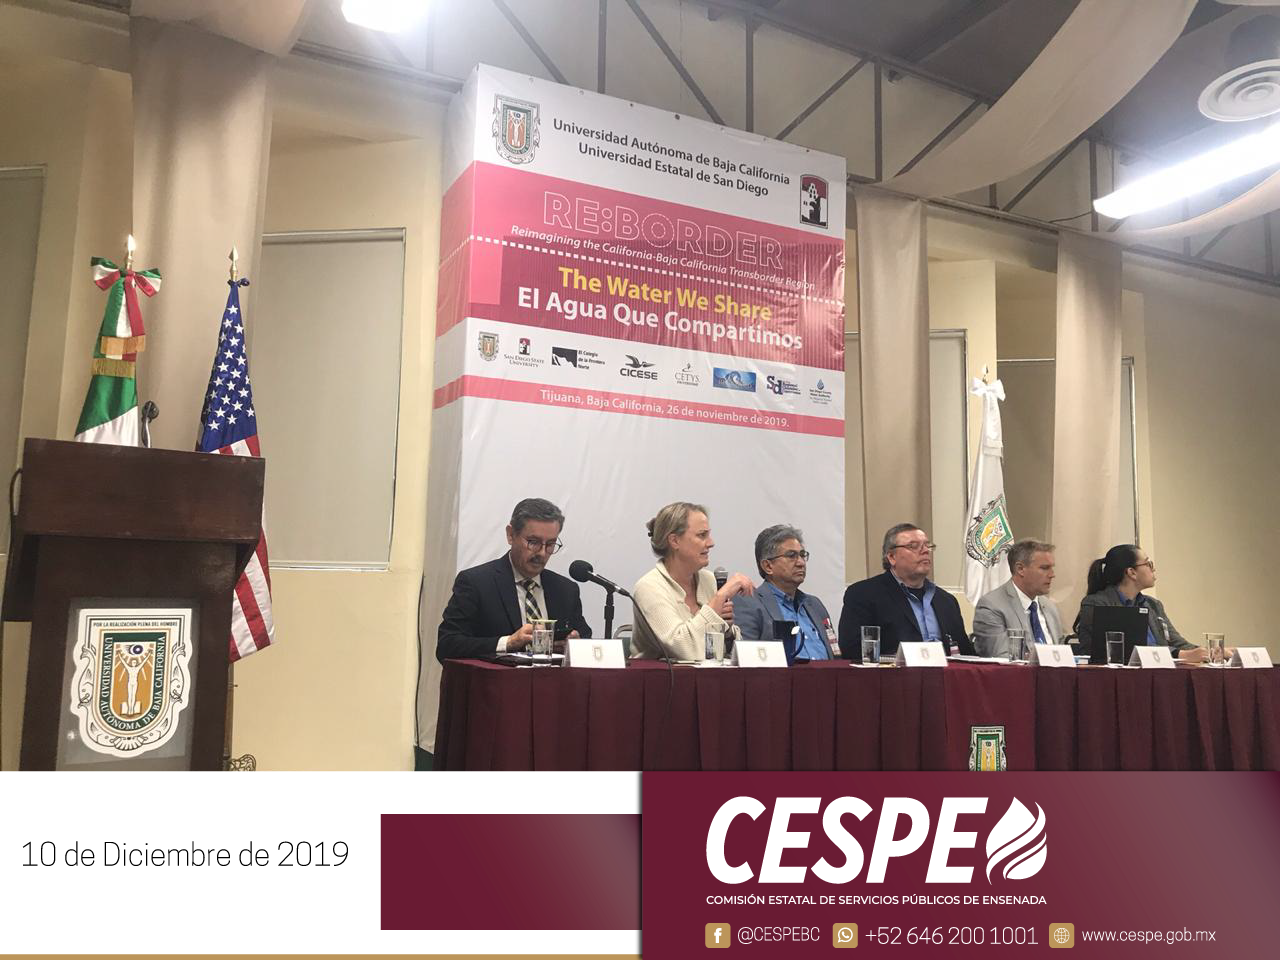 Equipo de la Unidad de Cultura del Agua 💧 de la CESPE asistió a la conferencia RE:BORDER